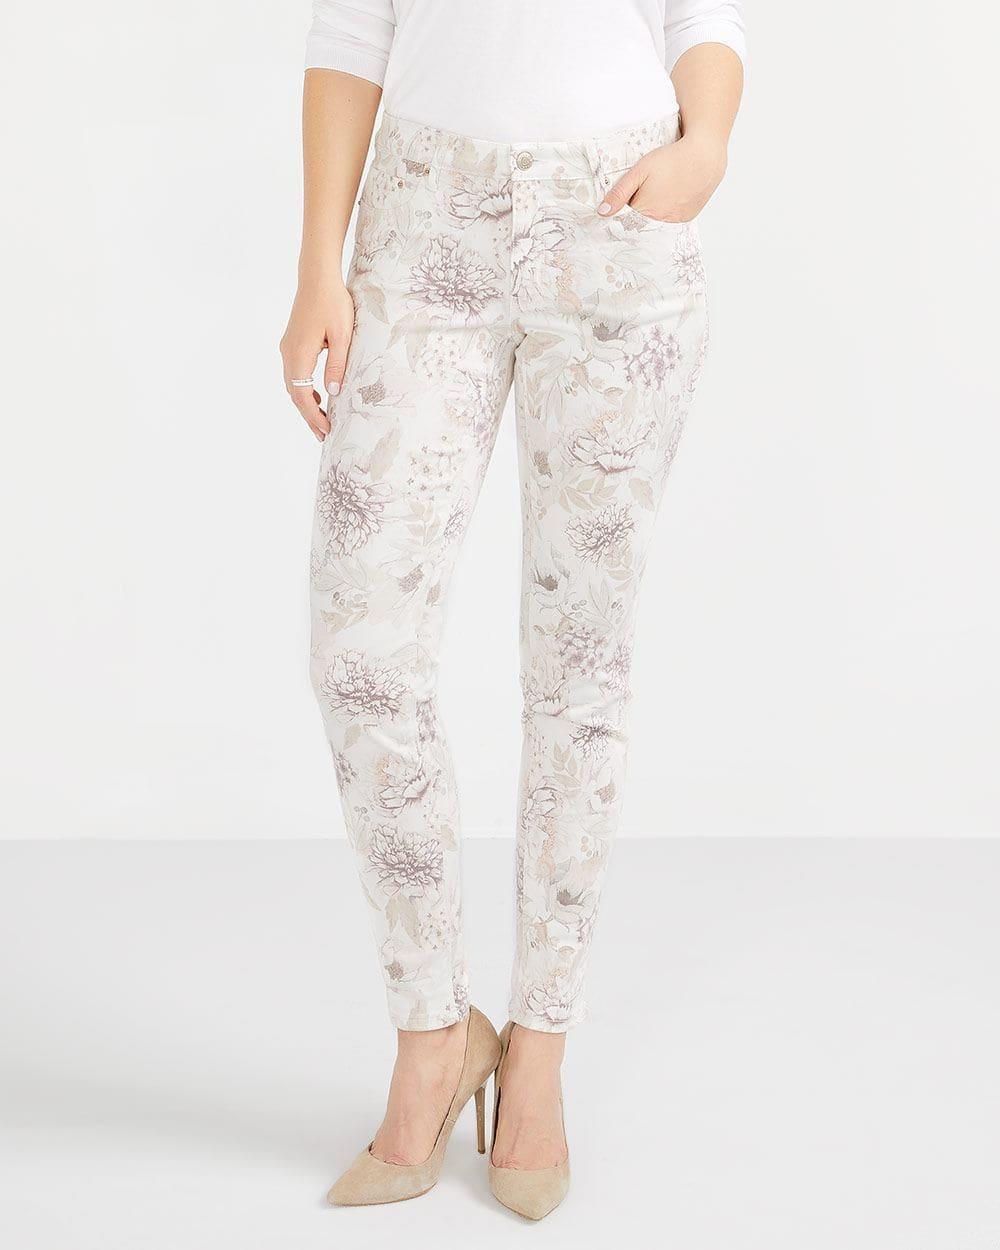 Petite Printed Skinny Jeans